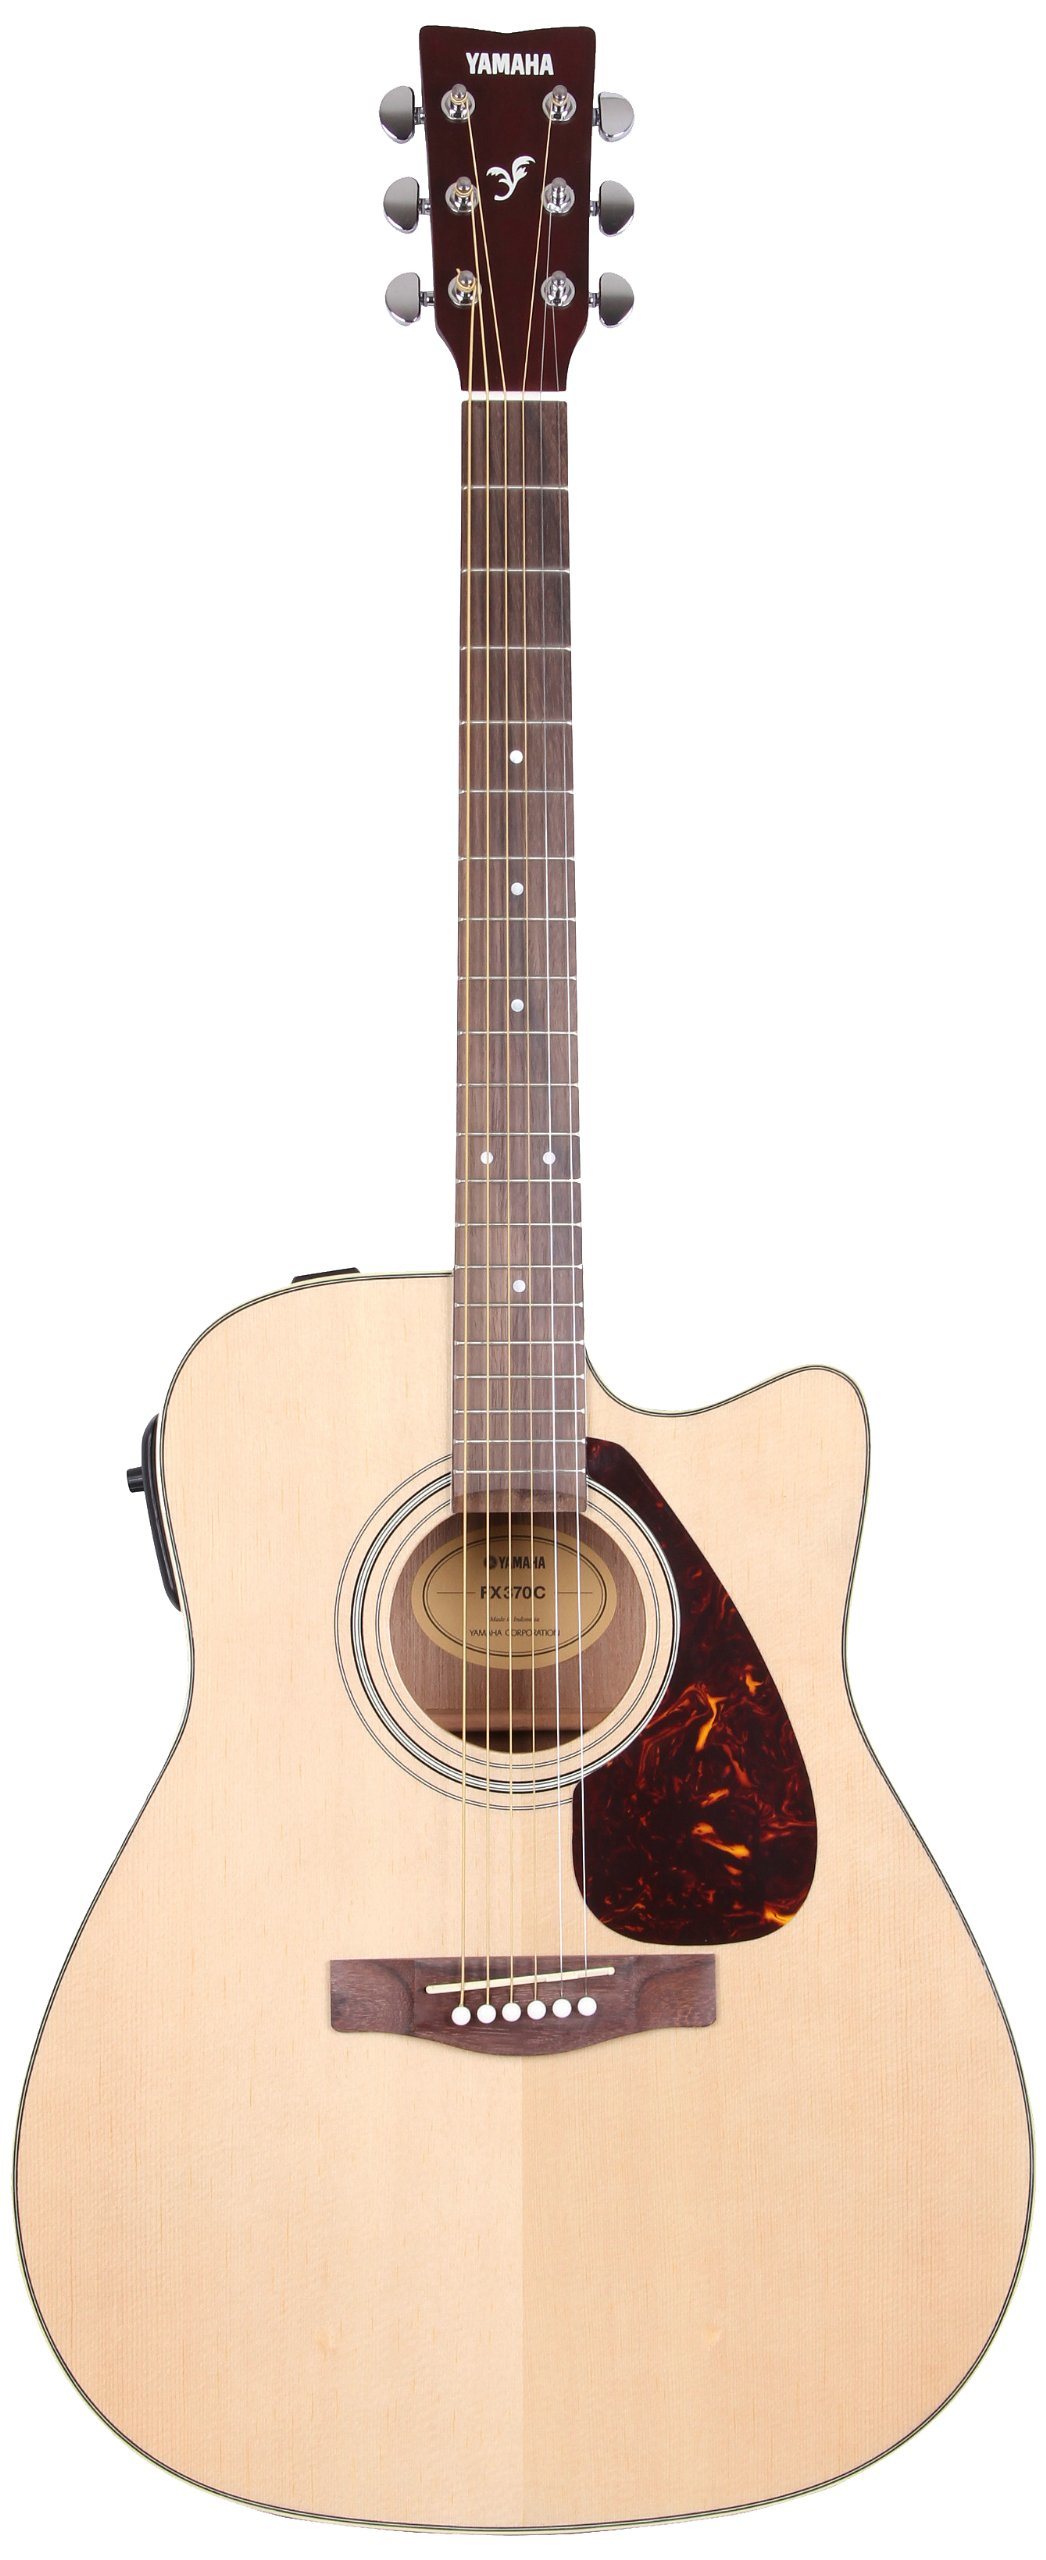 Yamaha Fx370c Full Size Electro Acoustic Guitar Natural Buy Online In Qatar At Qatar Desertcart Com Productid 47939395